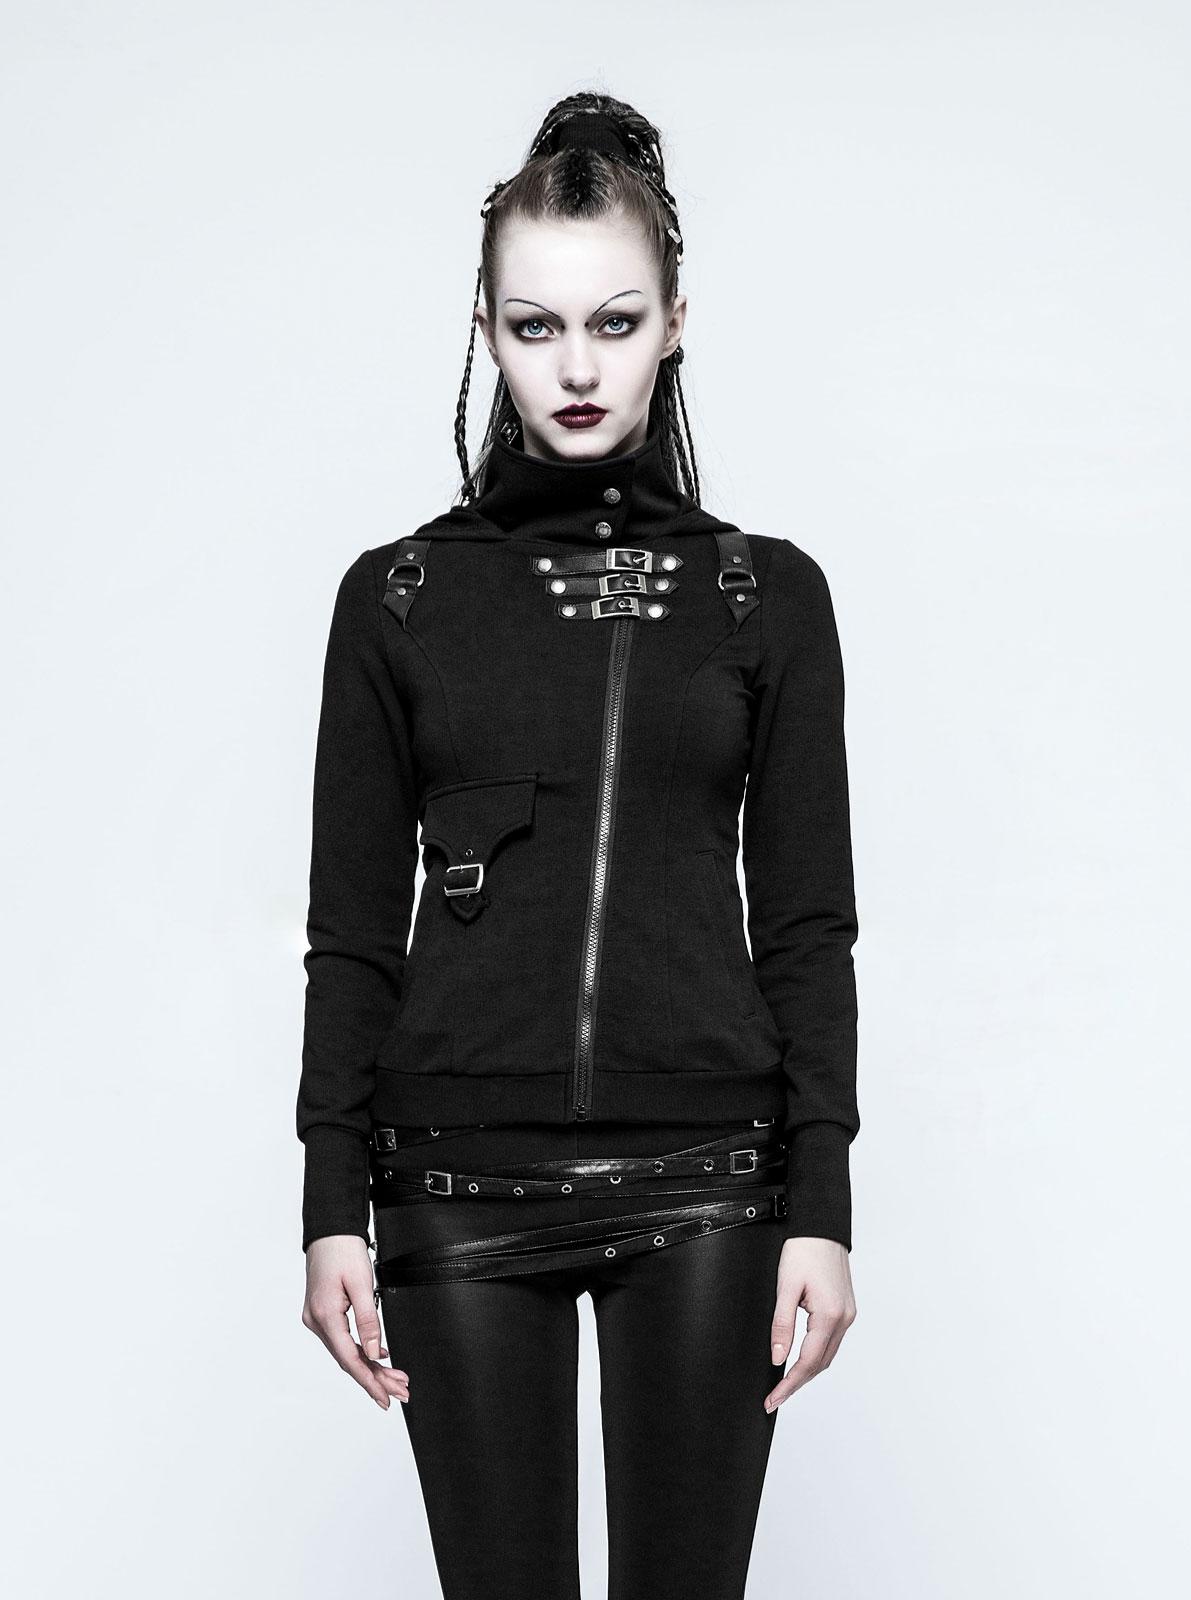 Goth hoodies